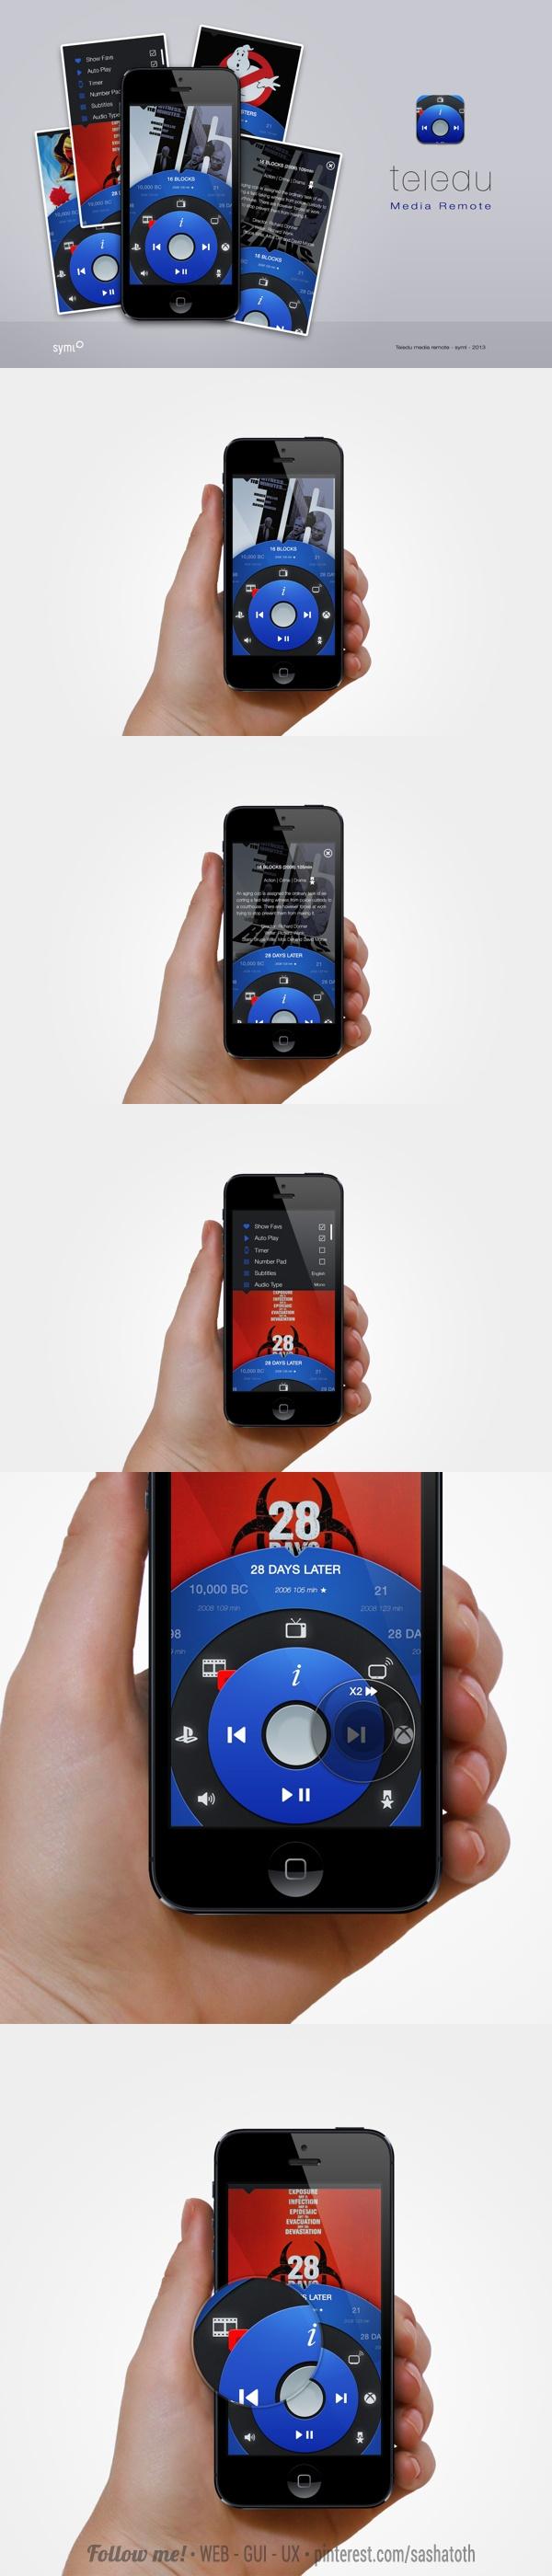 Teledu IOS media remote app concept by Ryan Jones *** #app #iphone #gui #ui #behance